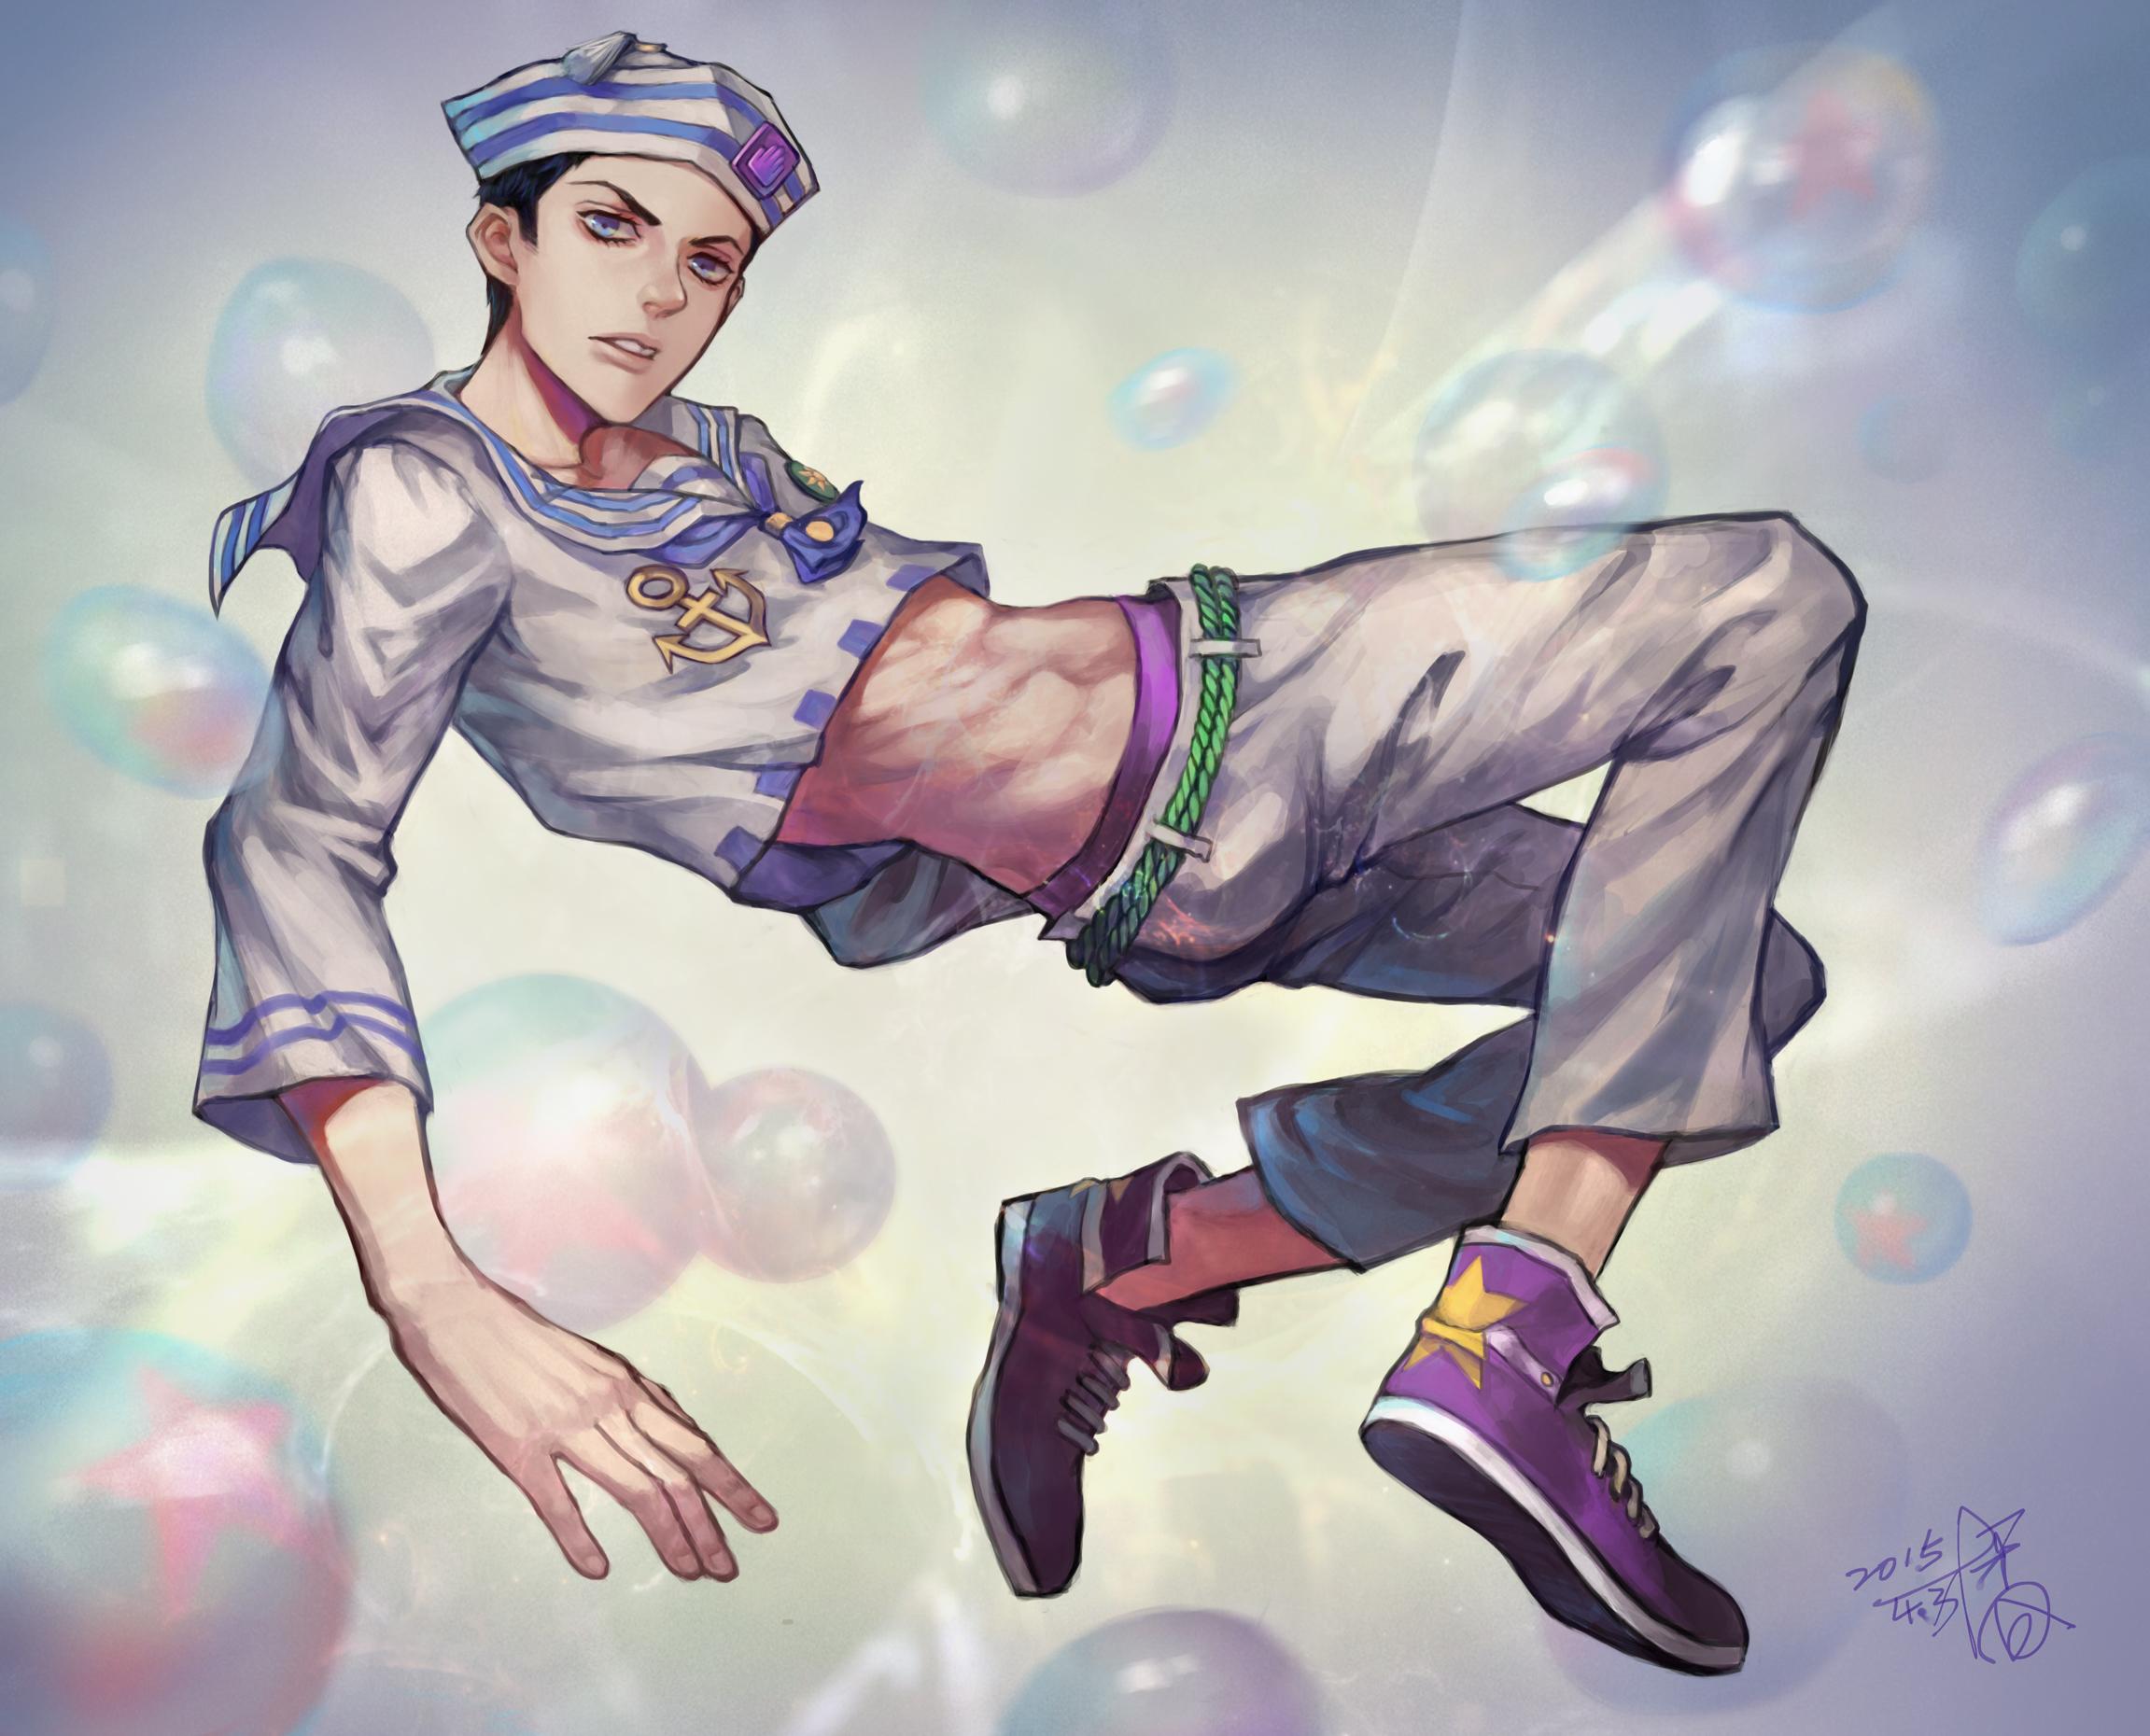 Higashikata Jousuke (JoJolion) Image #2168147 - Zerochan